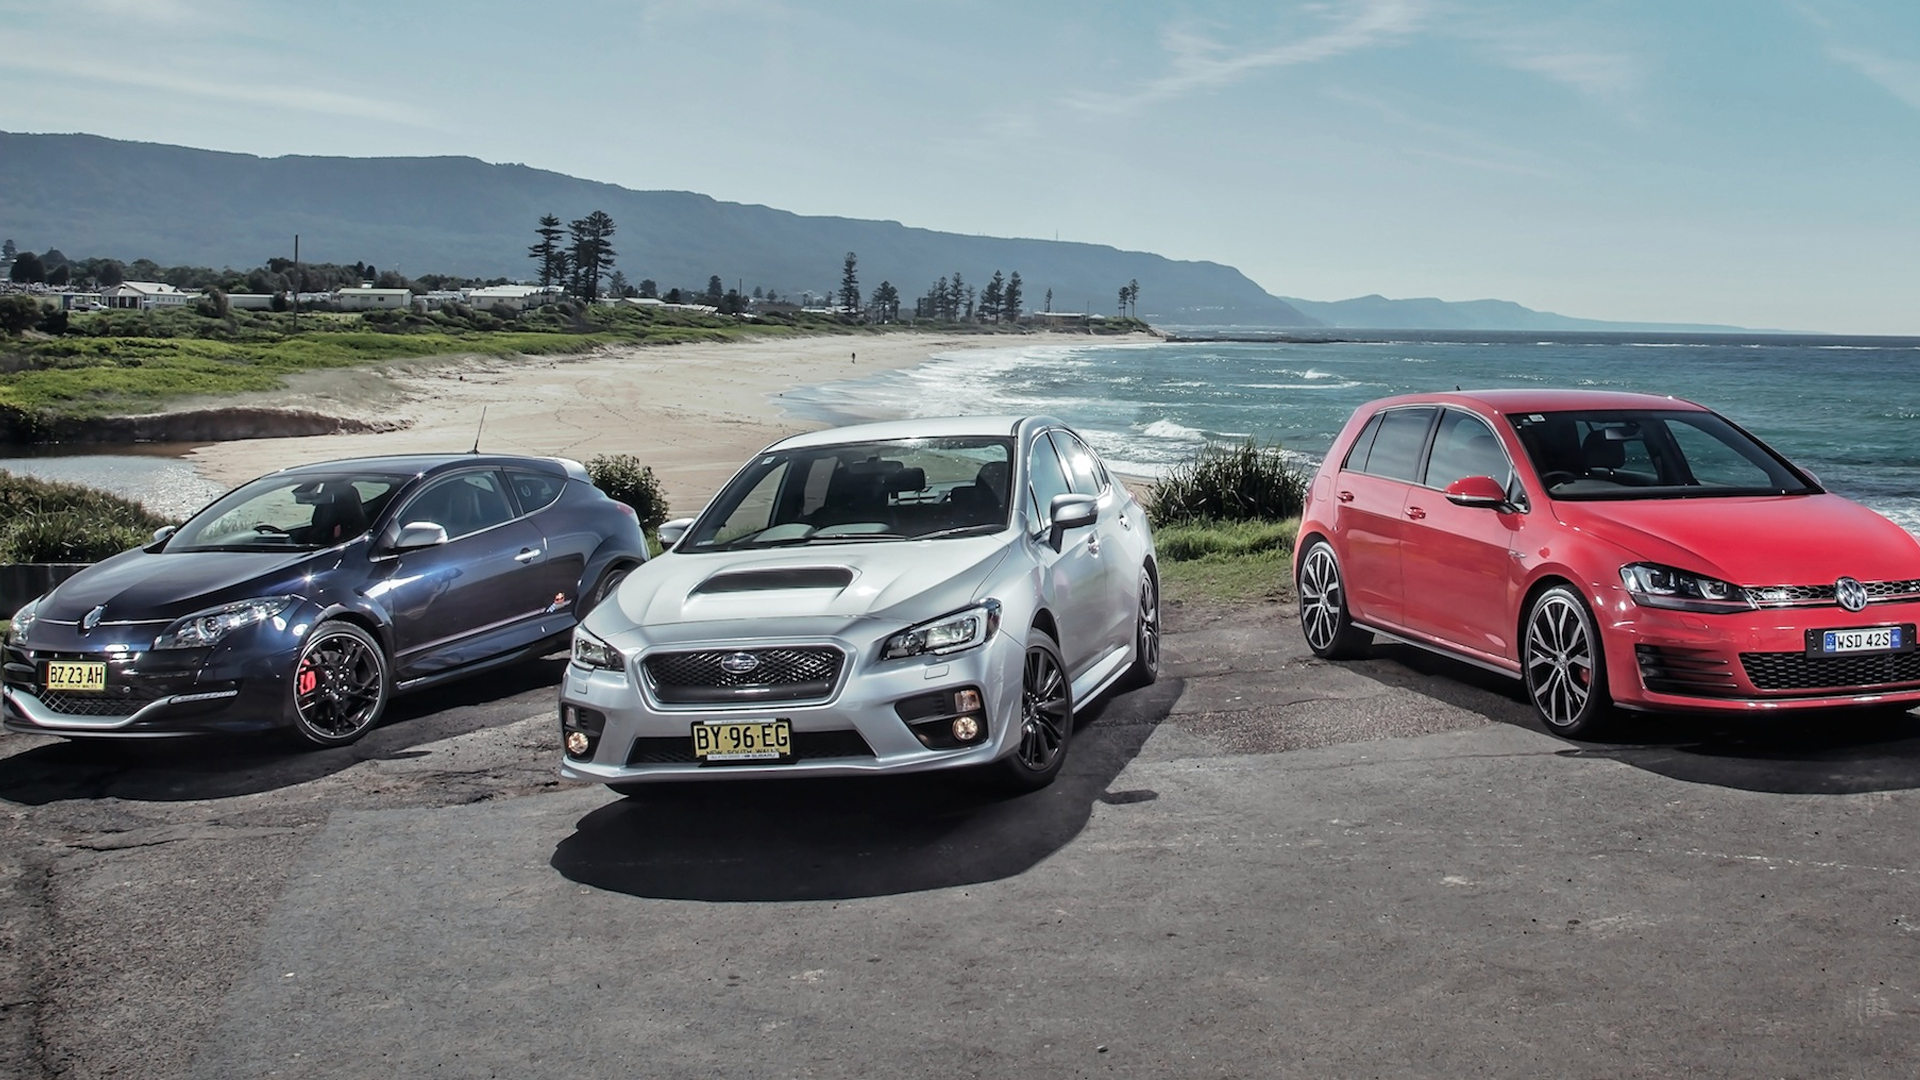 subaru volkswagen renault thumbnail - ردهبندی برندها و گروههای خودروسازی در 2018؛ کدوم گروهها بازار را در دست دارند؟